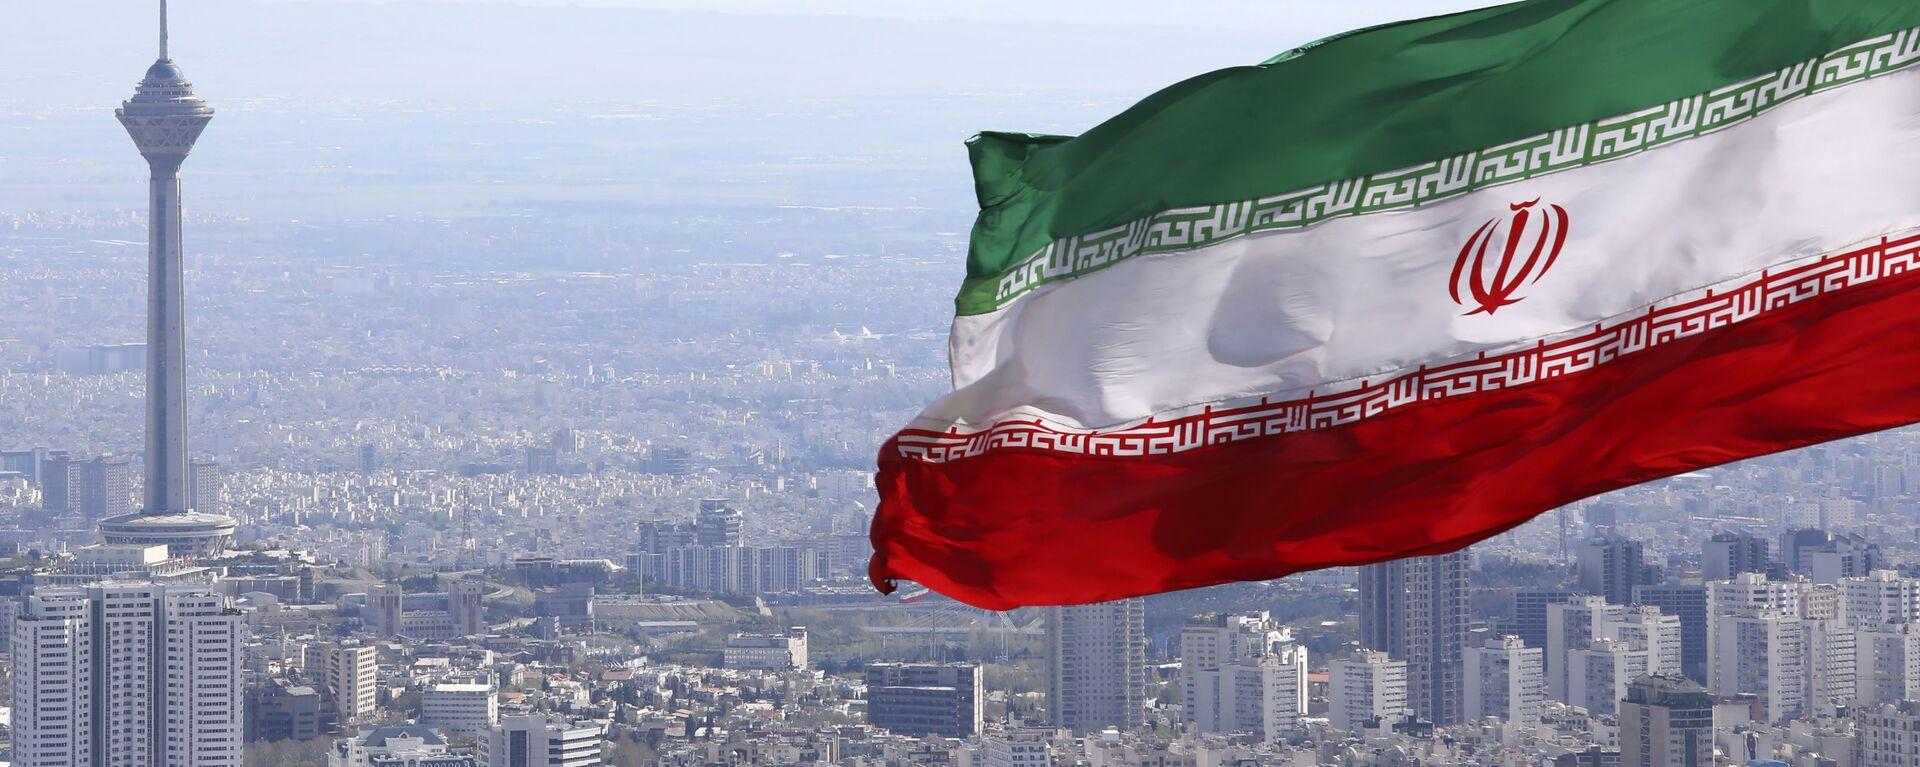 Bandiera iraniana, Iran, Teheran - Sputnik Italia, 1920, 03.05.2021